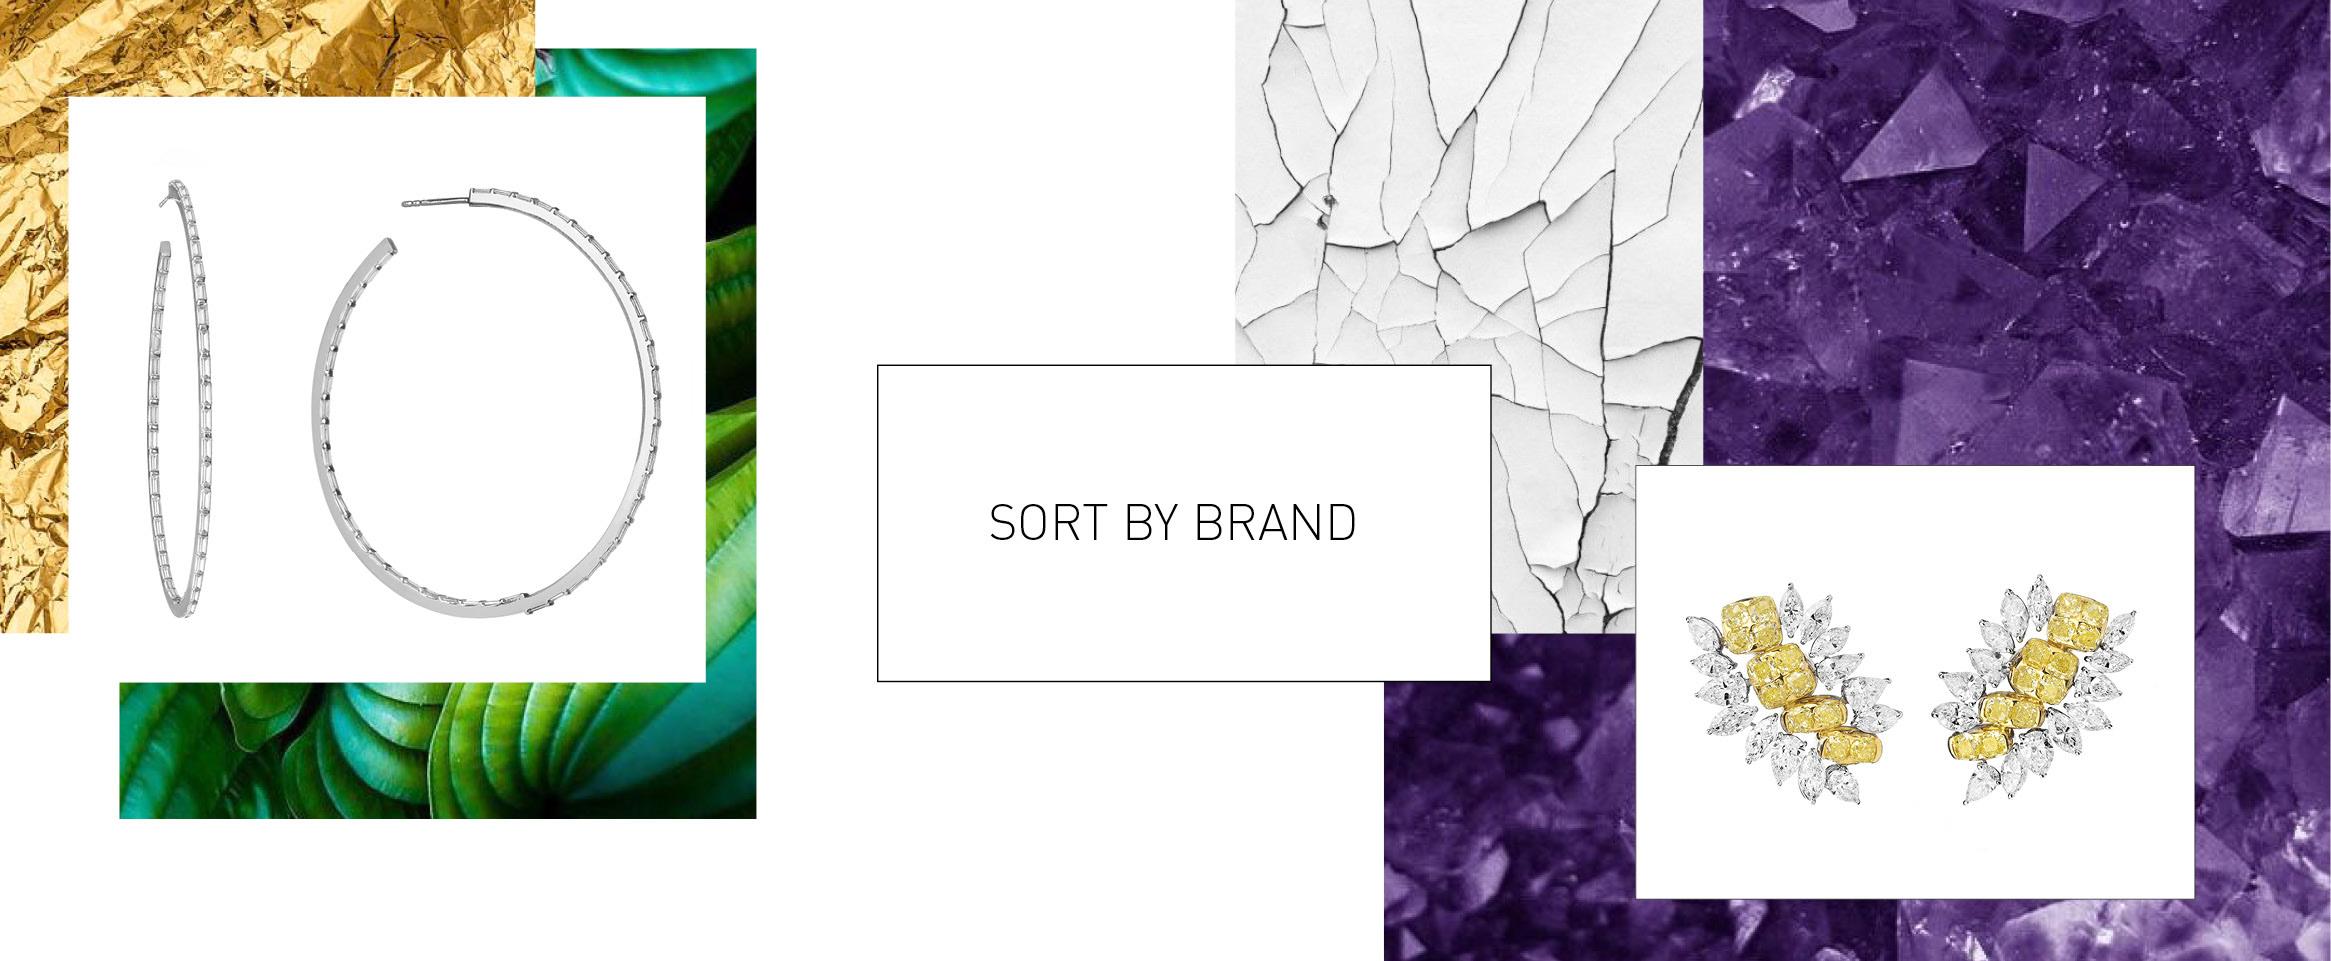 LUM_banners_SORT by brands.jpg